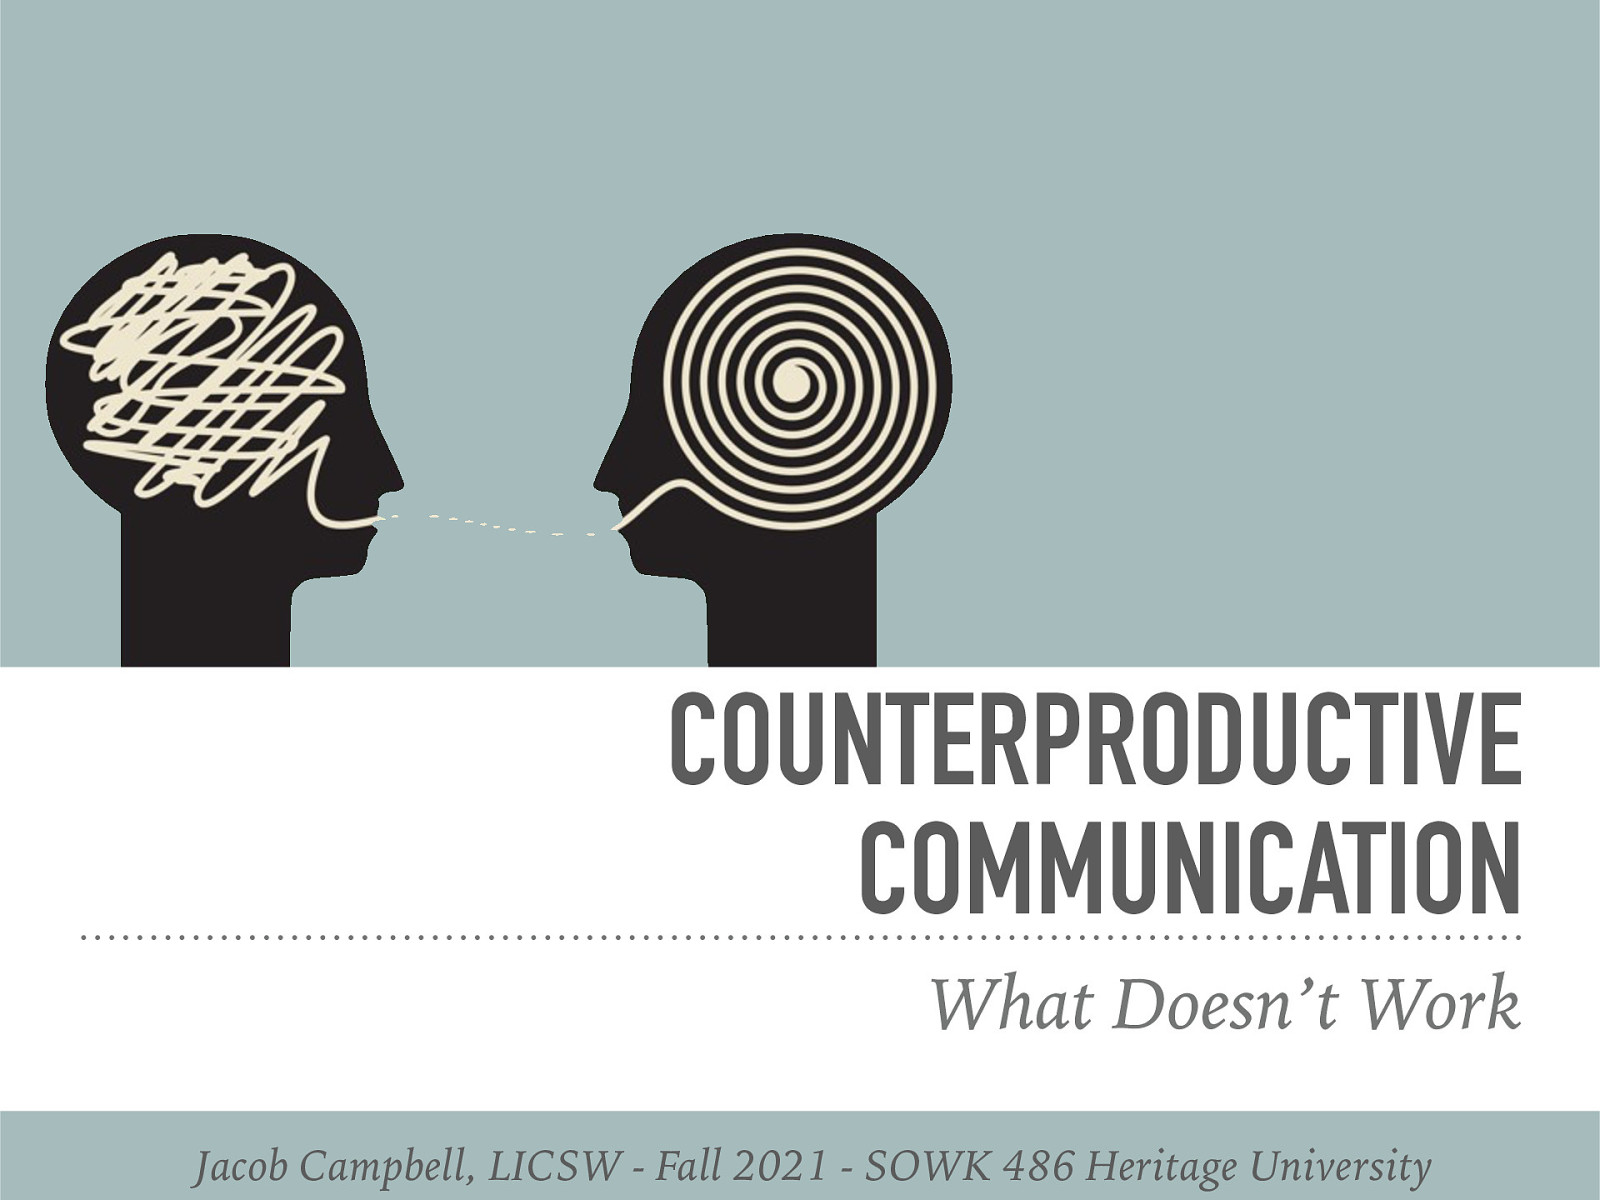 SOWK 486 - Week 07 - Counterproductive Communication